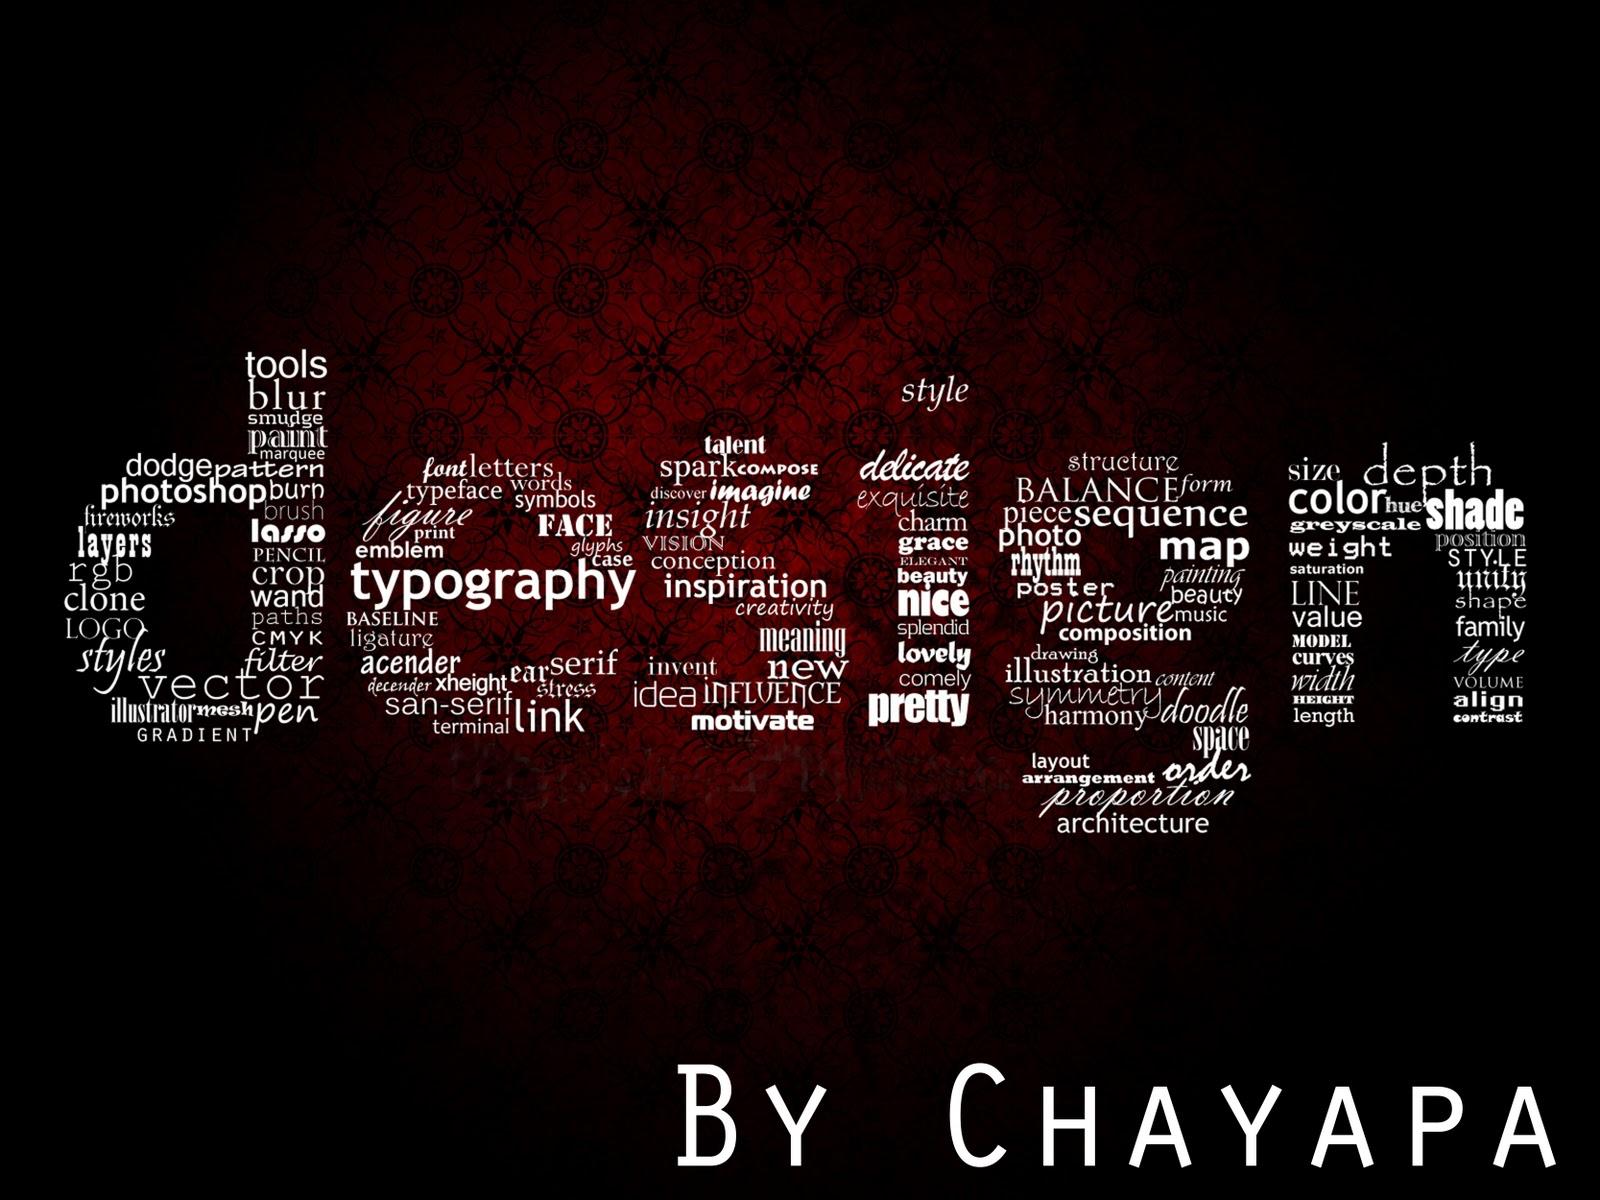 http://2.bp.blogspot.com/_jT2tpBwwZwg/TUwD3l1AtpI/AAAAAAAAABg/HdlQvPr-SCI/s1600/10_Best_Typography_Design_Wallpaper_07.jpg